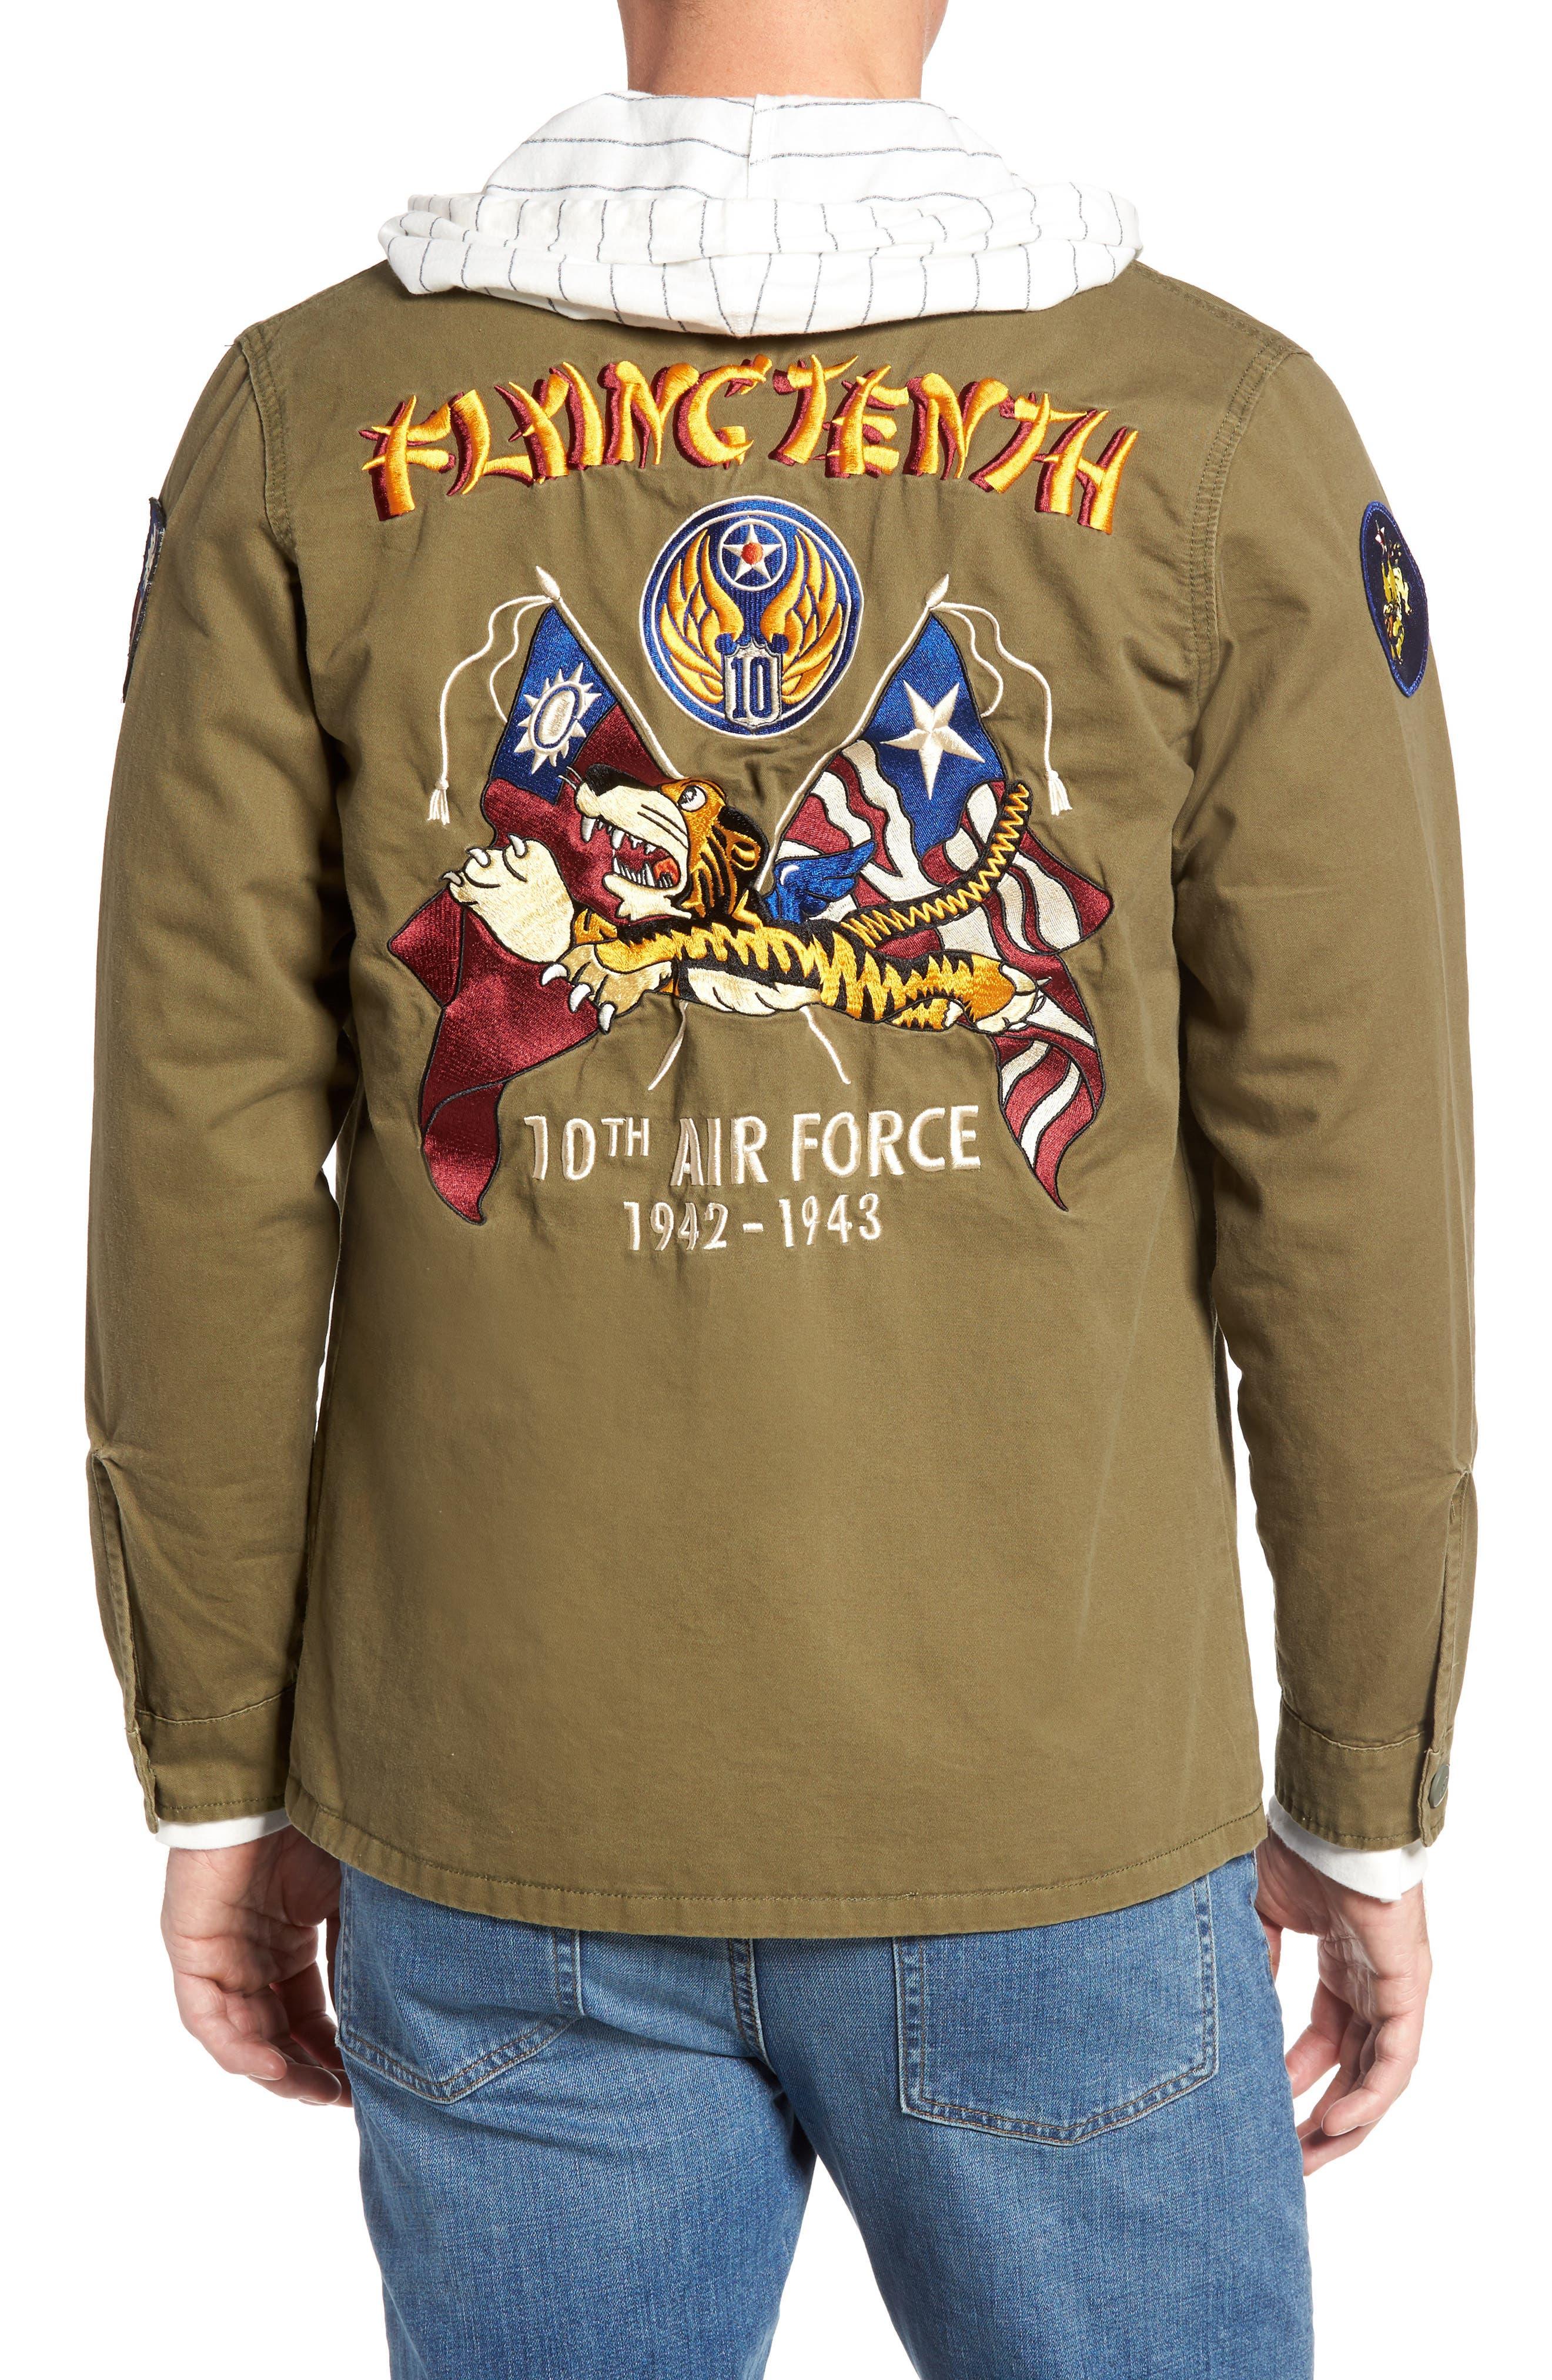 Flying Tenth Fatigue Shirt,                             Alternate thumbnail 2, color,